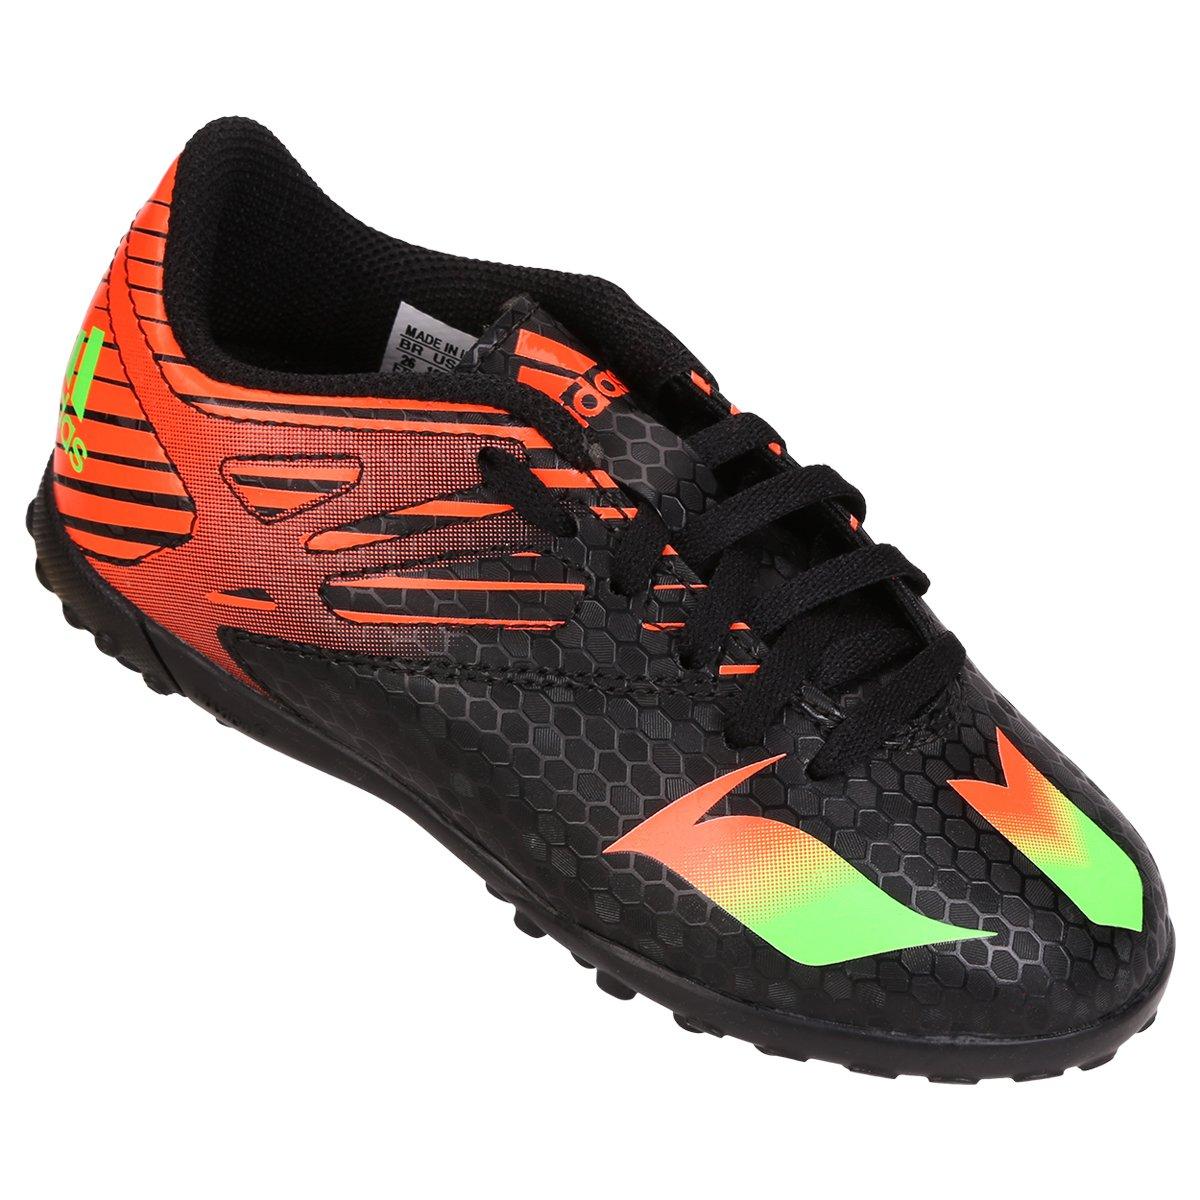 Chuteira Adidas Messi 15.4 TF Society Juvenil - Compre Agora  07f27aa69ab16